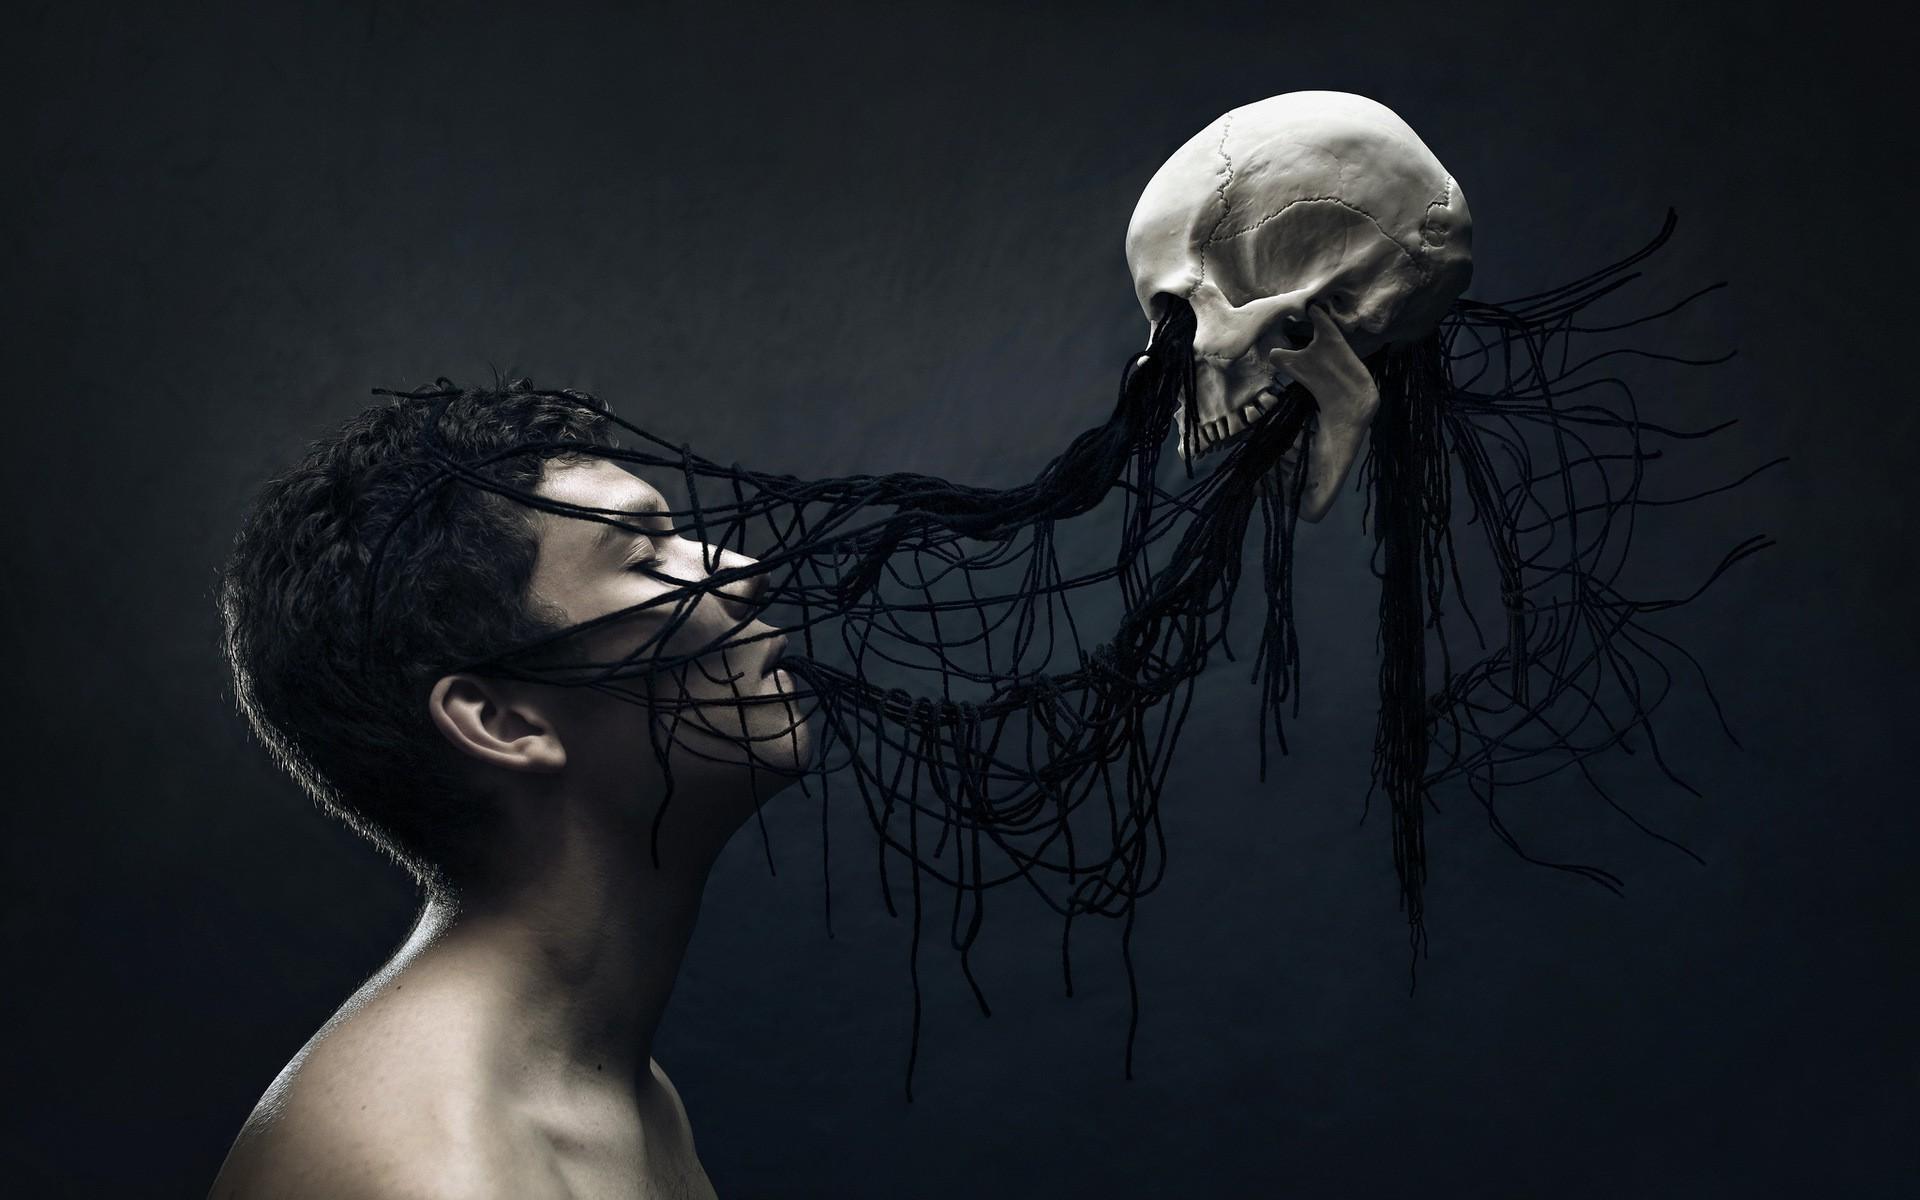 Res: 1920x1200, men, Digital Art, Fantasy Art, Skull, Death, Spooky, Gothic Wallpapers HD /  Desktop and Mobile Backgrounds